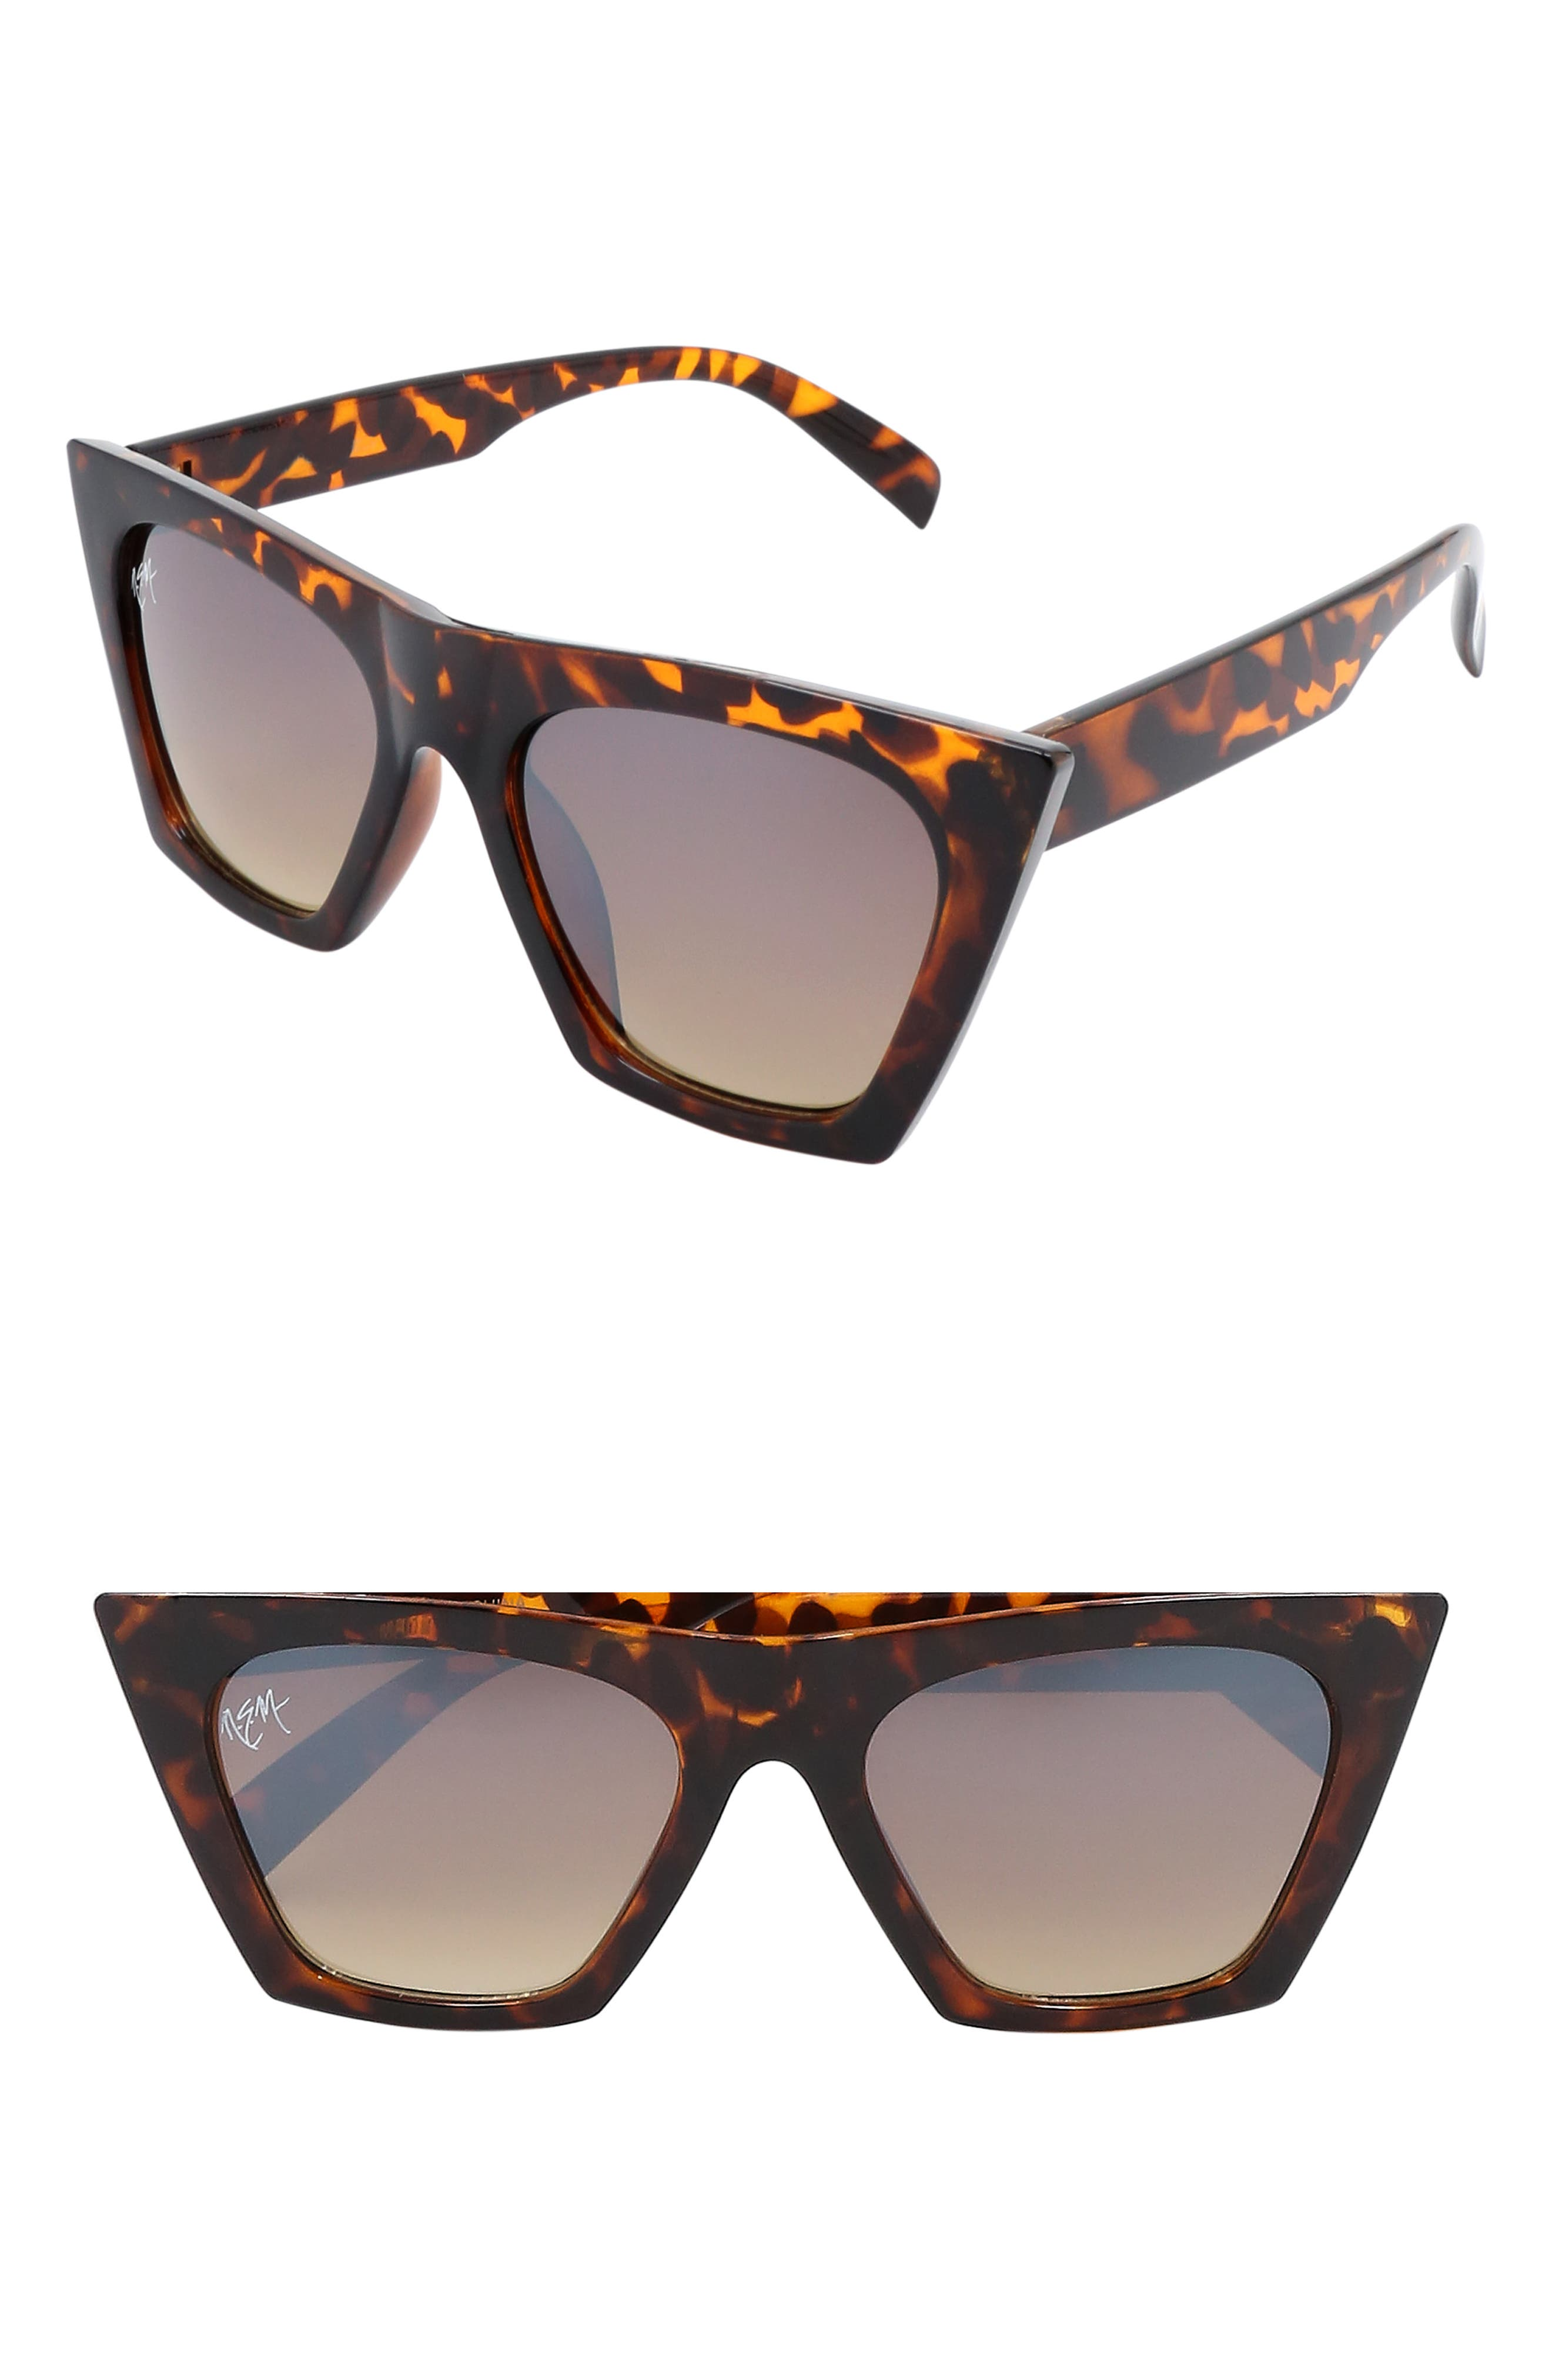 c649ce283fd 1950s Sunglasses   50s Glasses